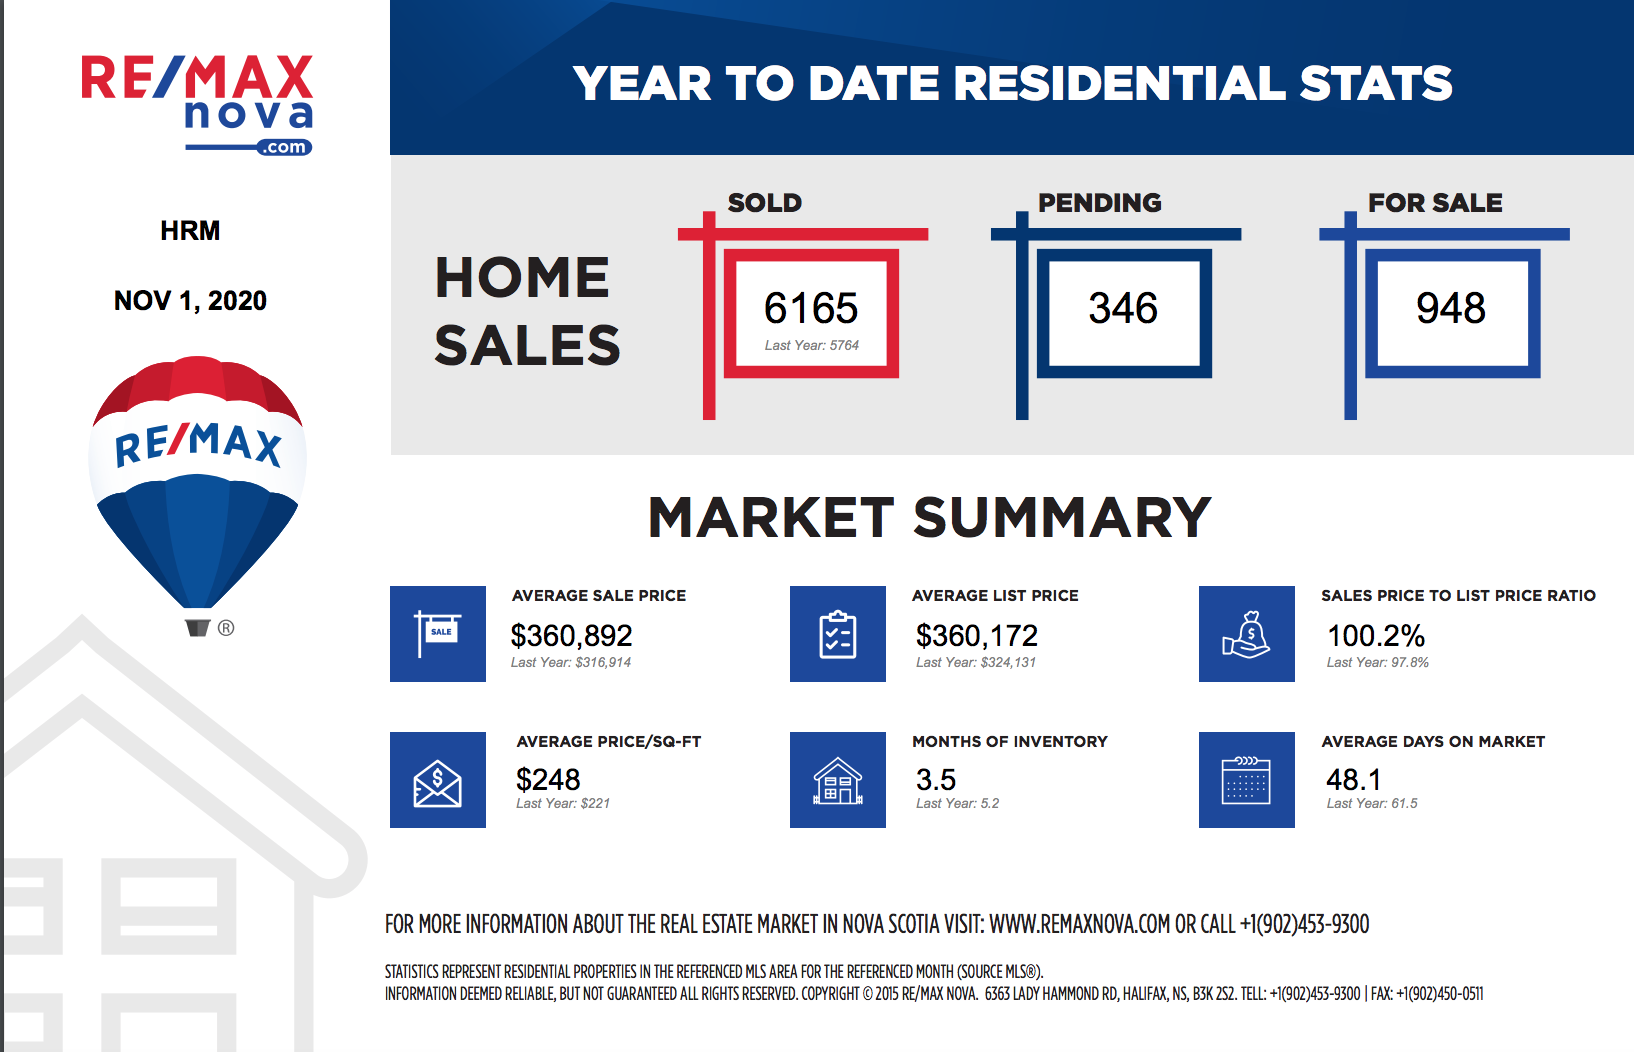 Halifax real esdtate market summary as of October 2020 | RE/MAX NOVA® | MLS® listings